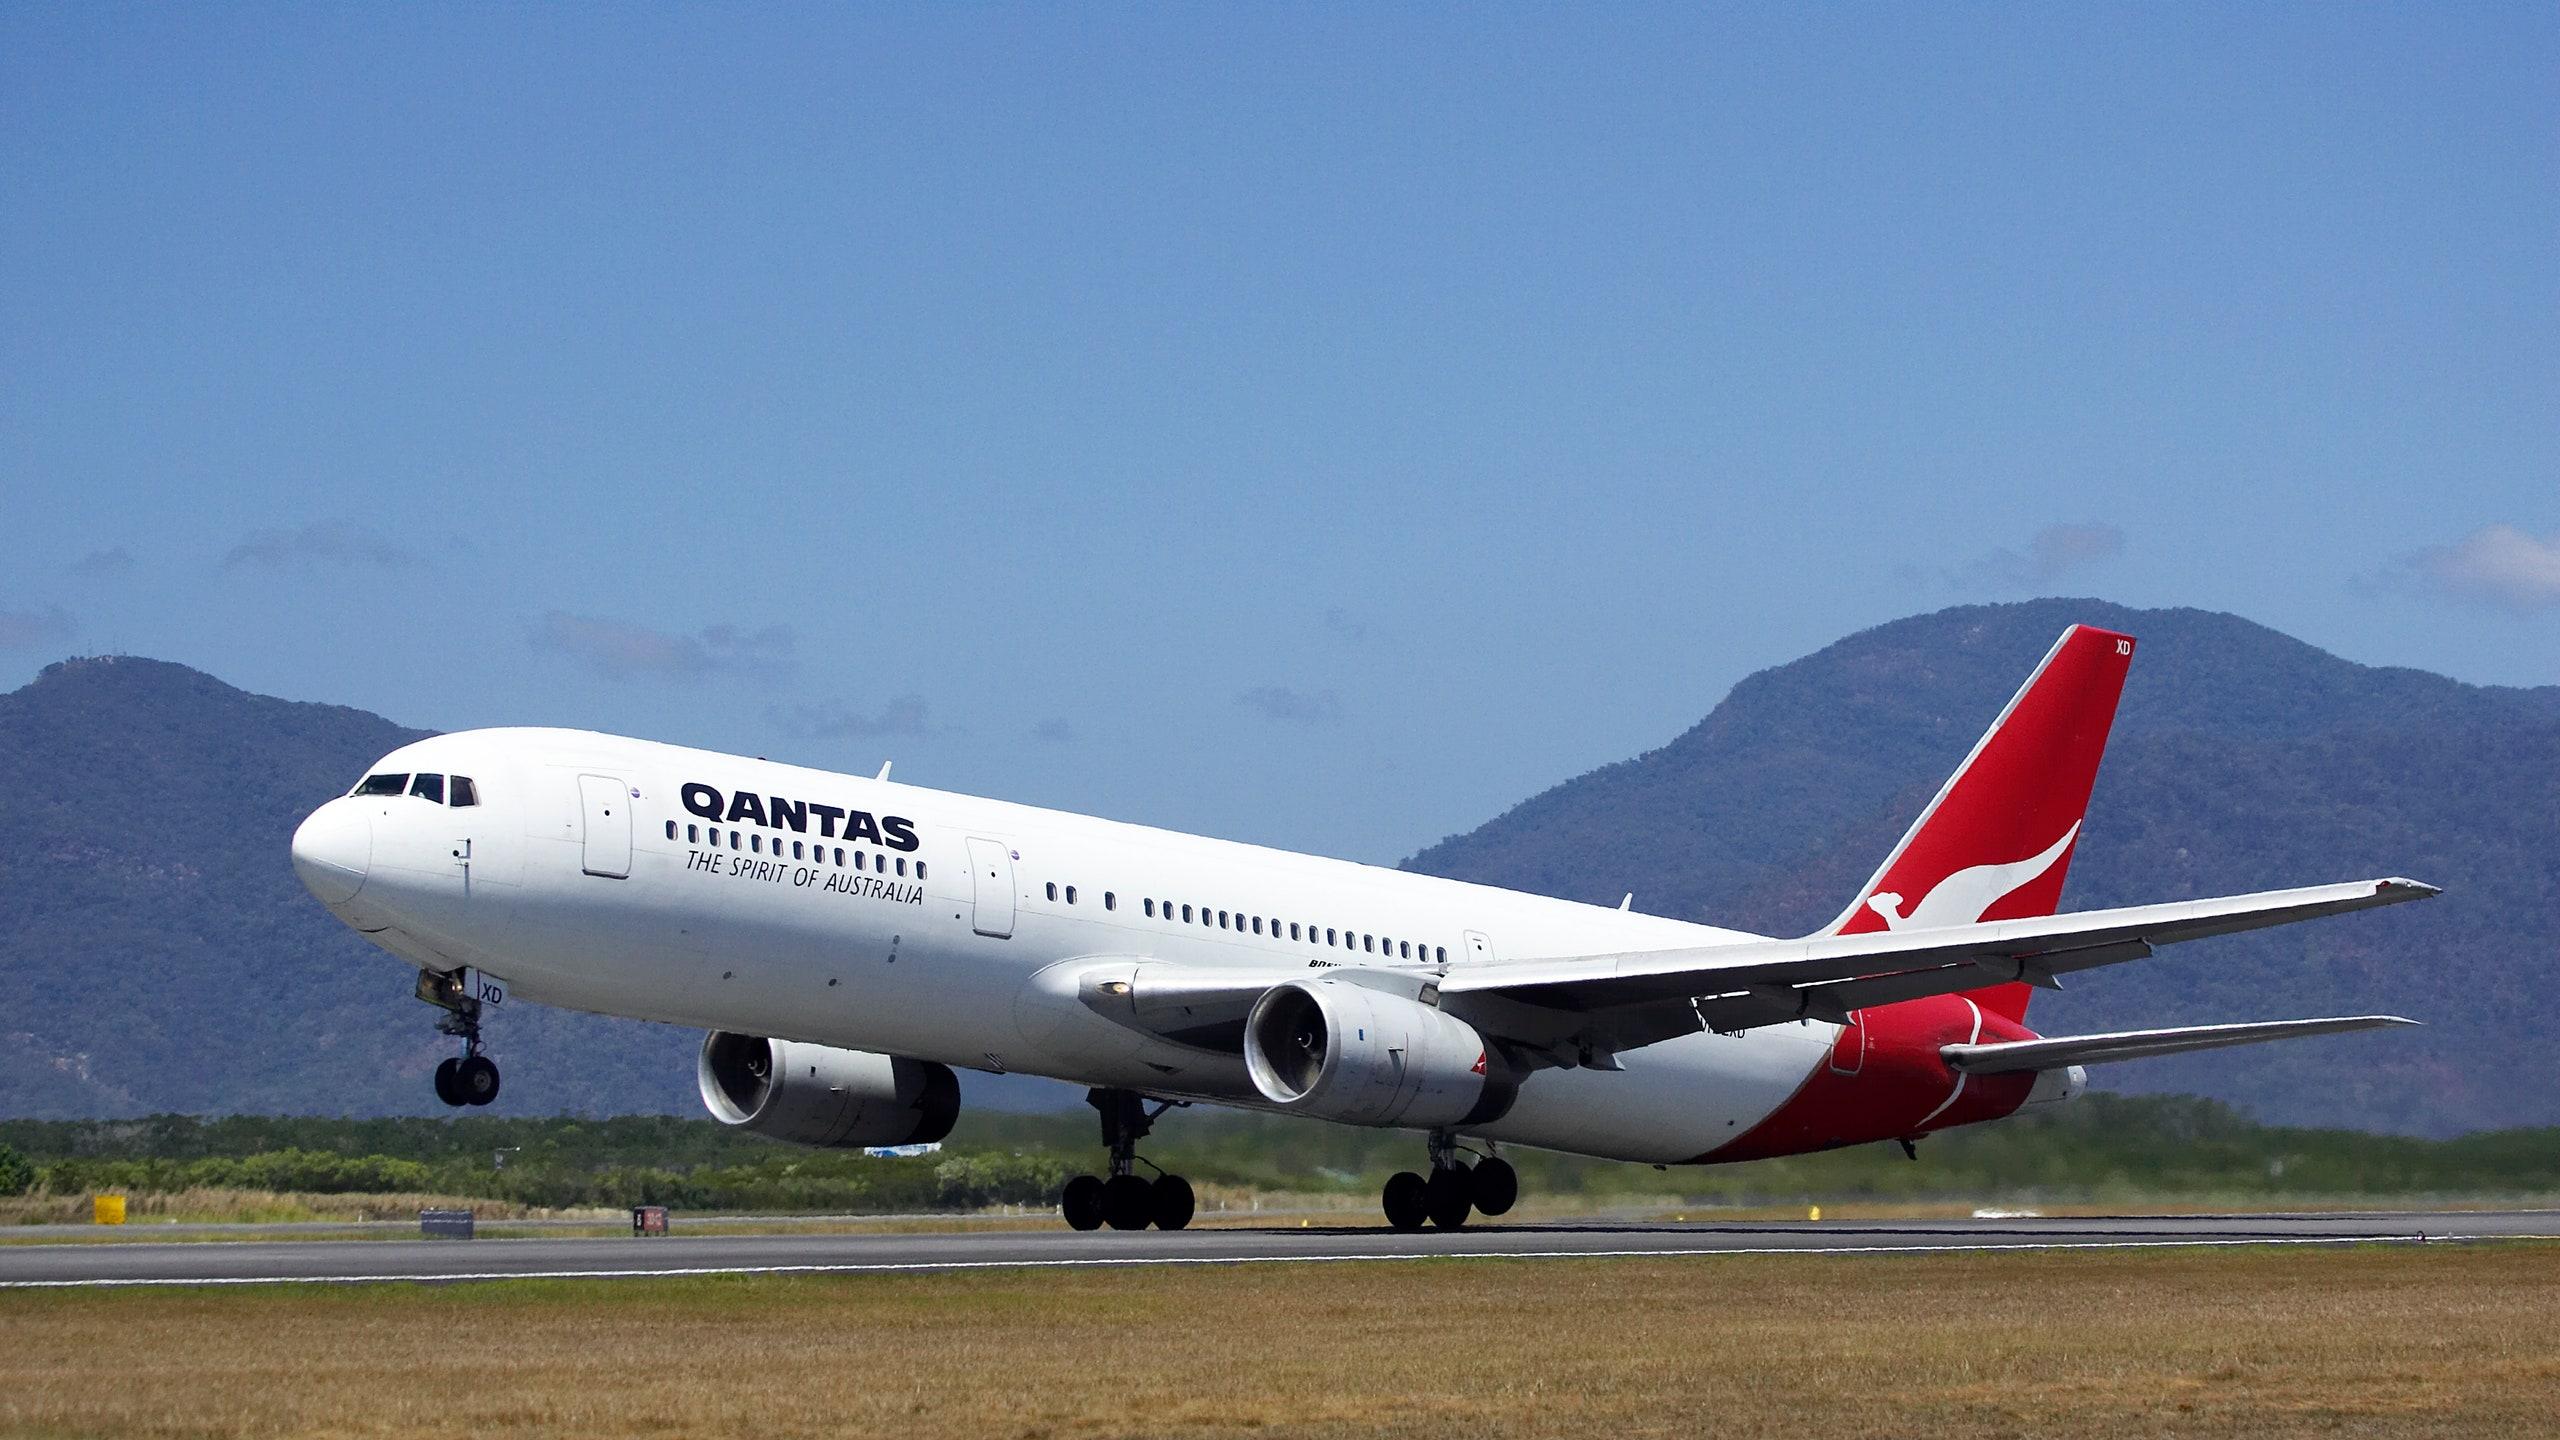 Qantas: 1st International flights sold out